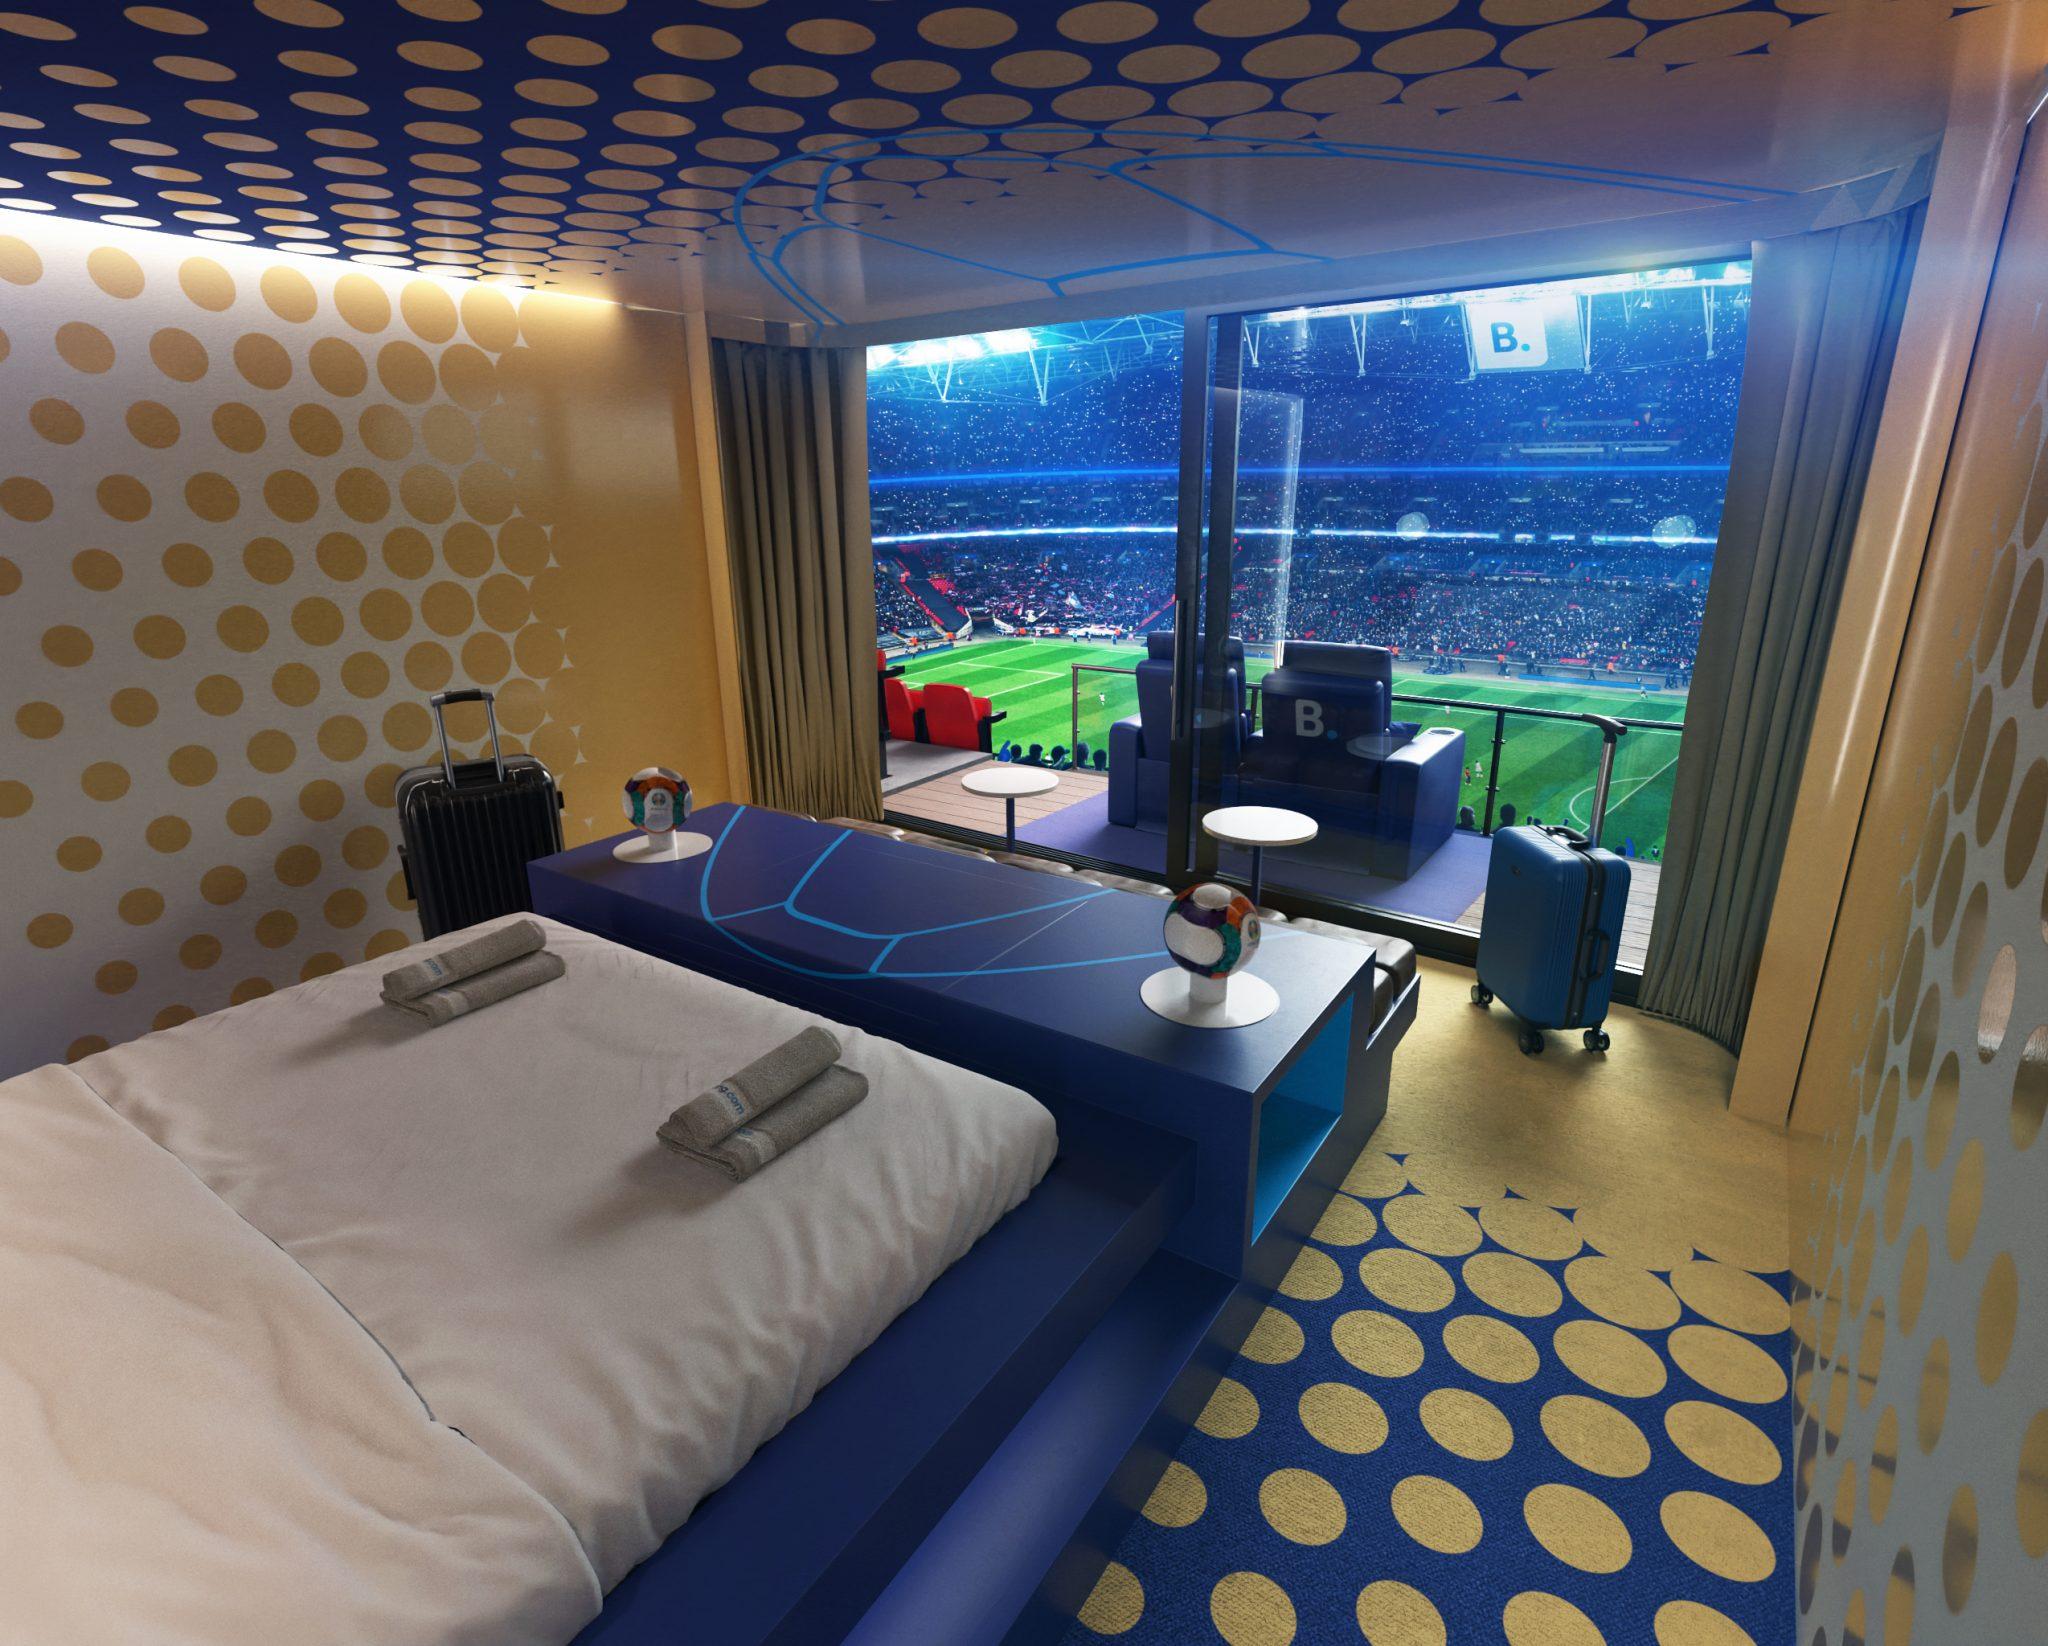 Booking.com Stadium Suite - Pitch view